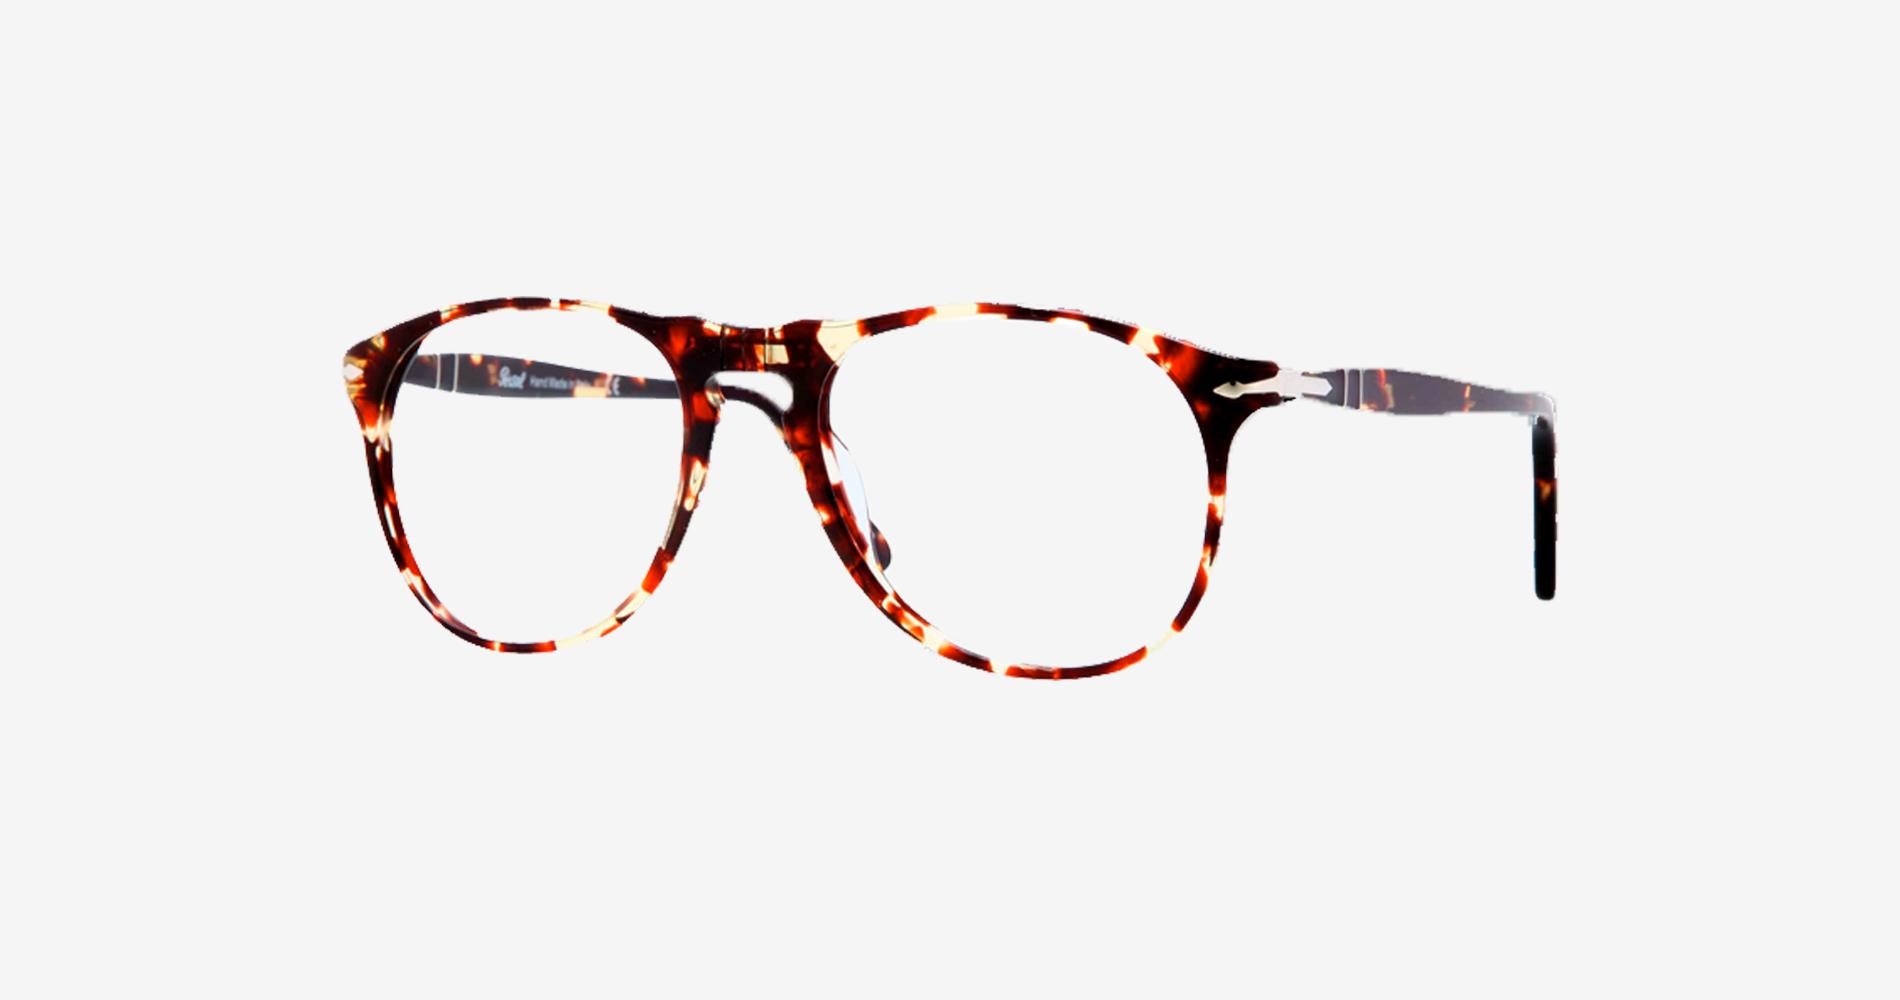 Comment choisir ses lunettes selon sa morpho   Comment choisir ses lunettes  selon sa morpho   283842a62194